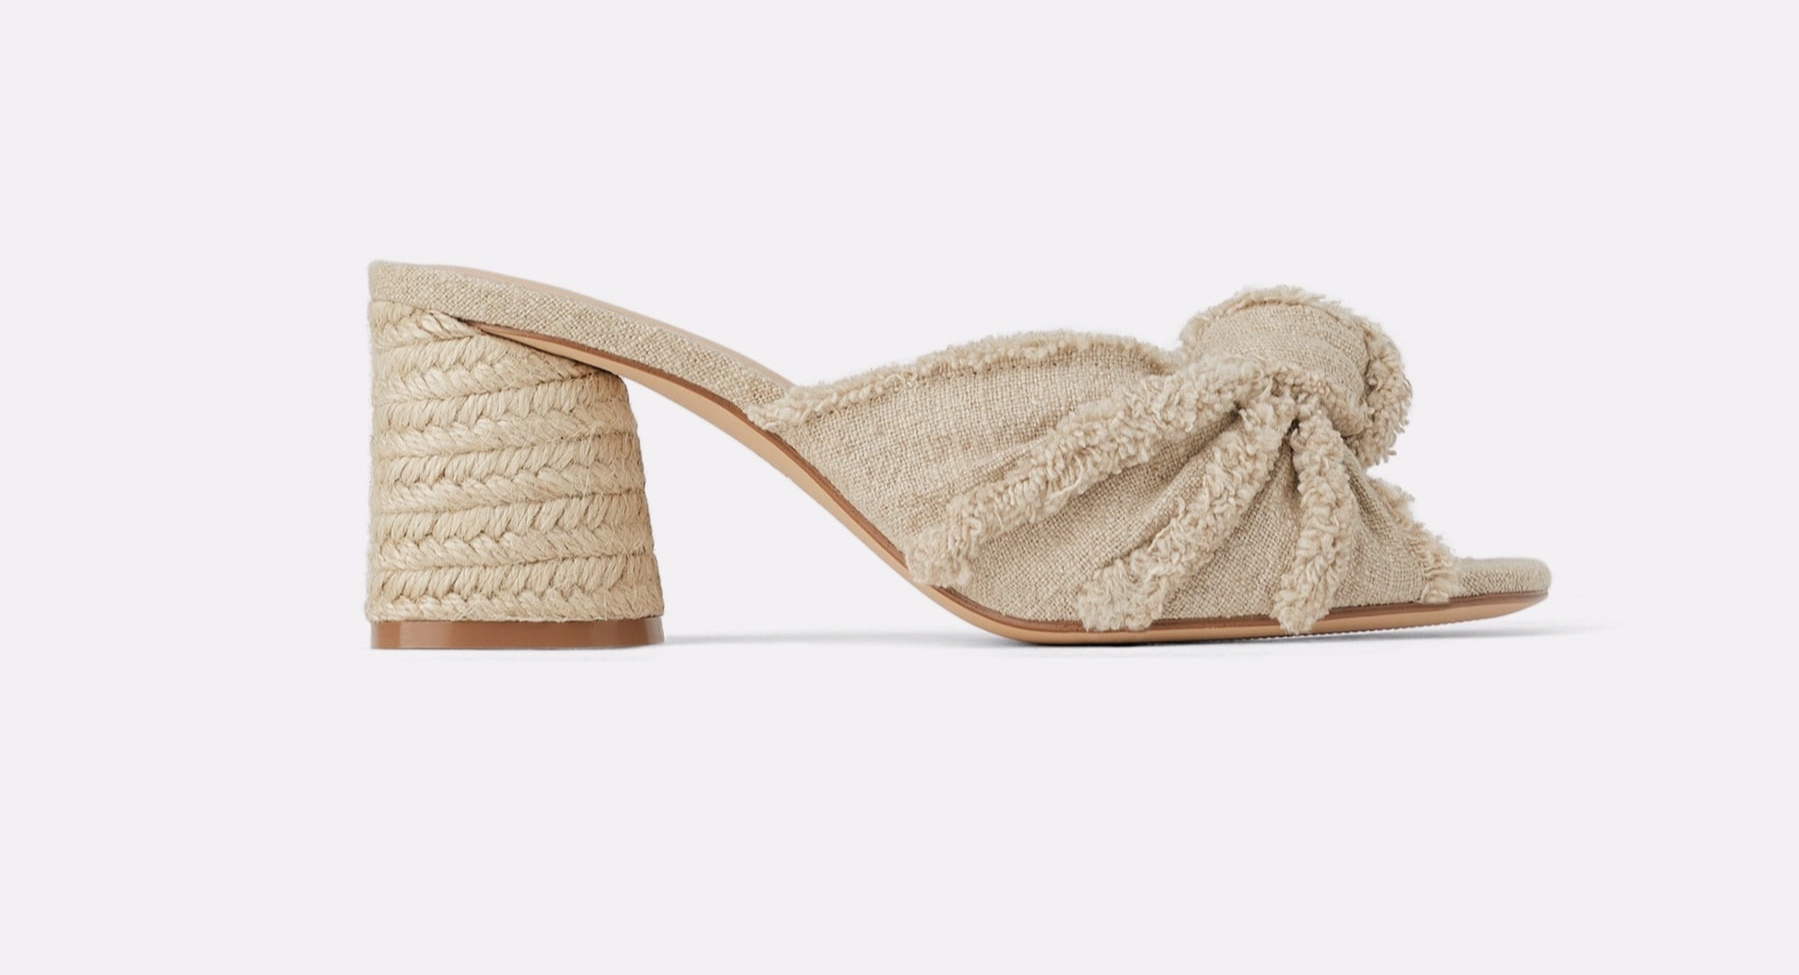 Zara knotted mules